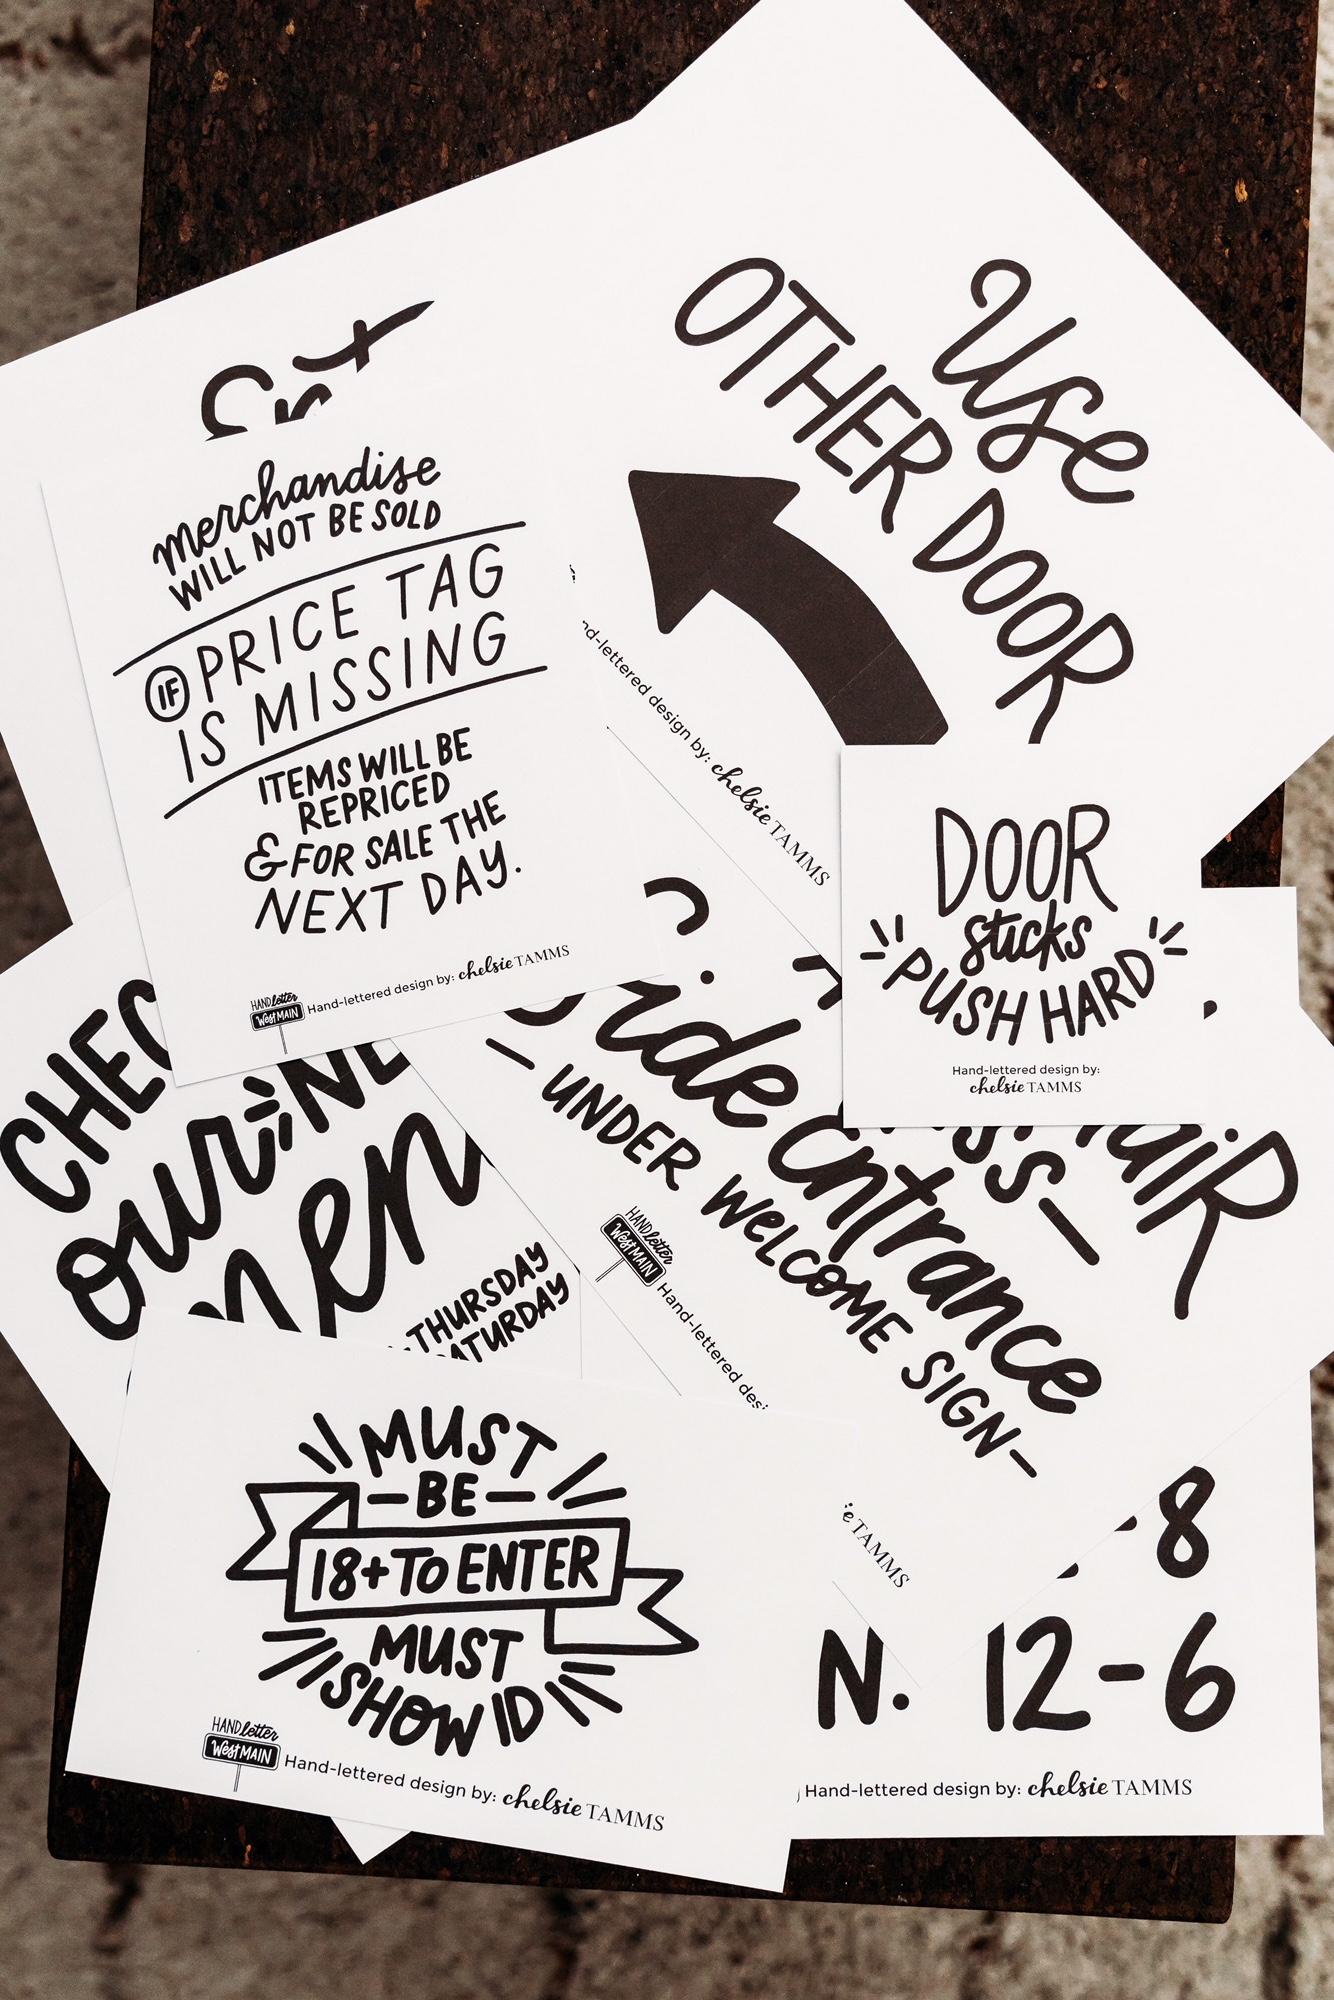 Hand Lettered Signage